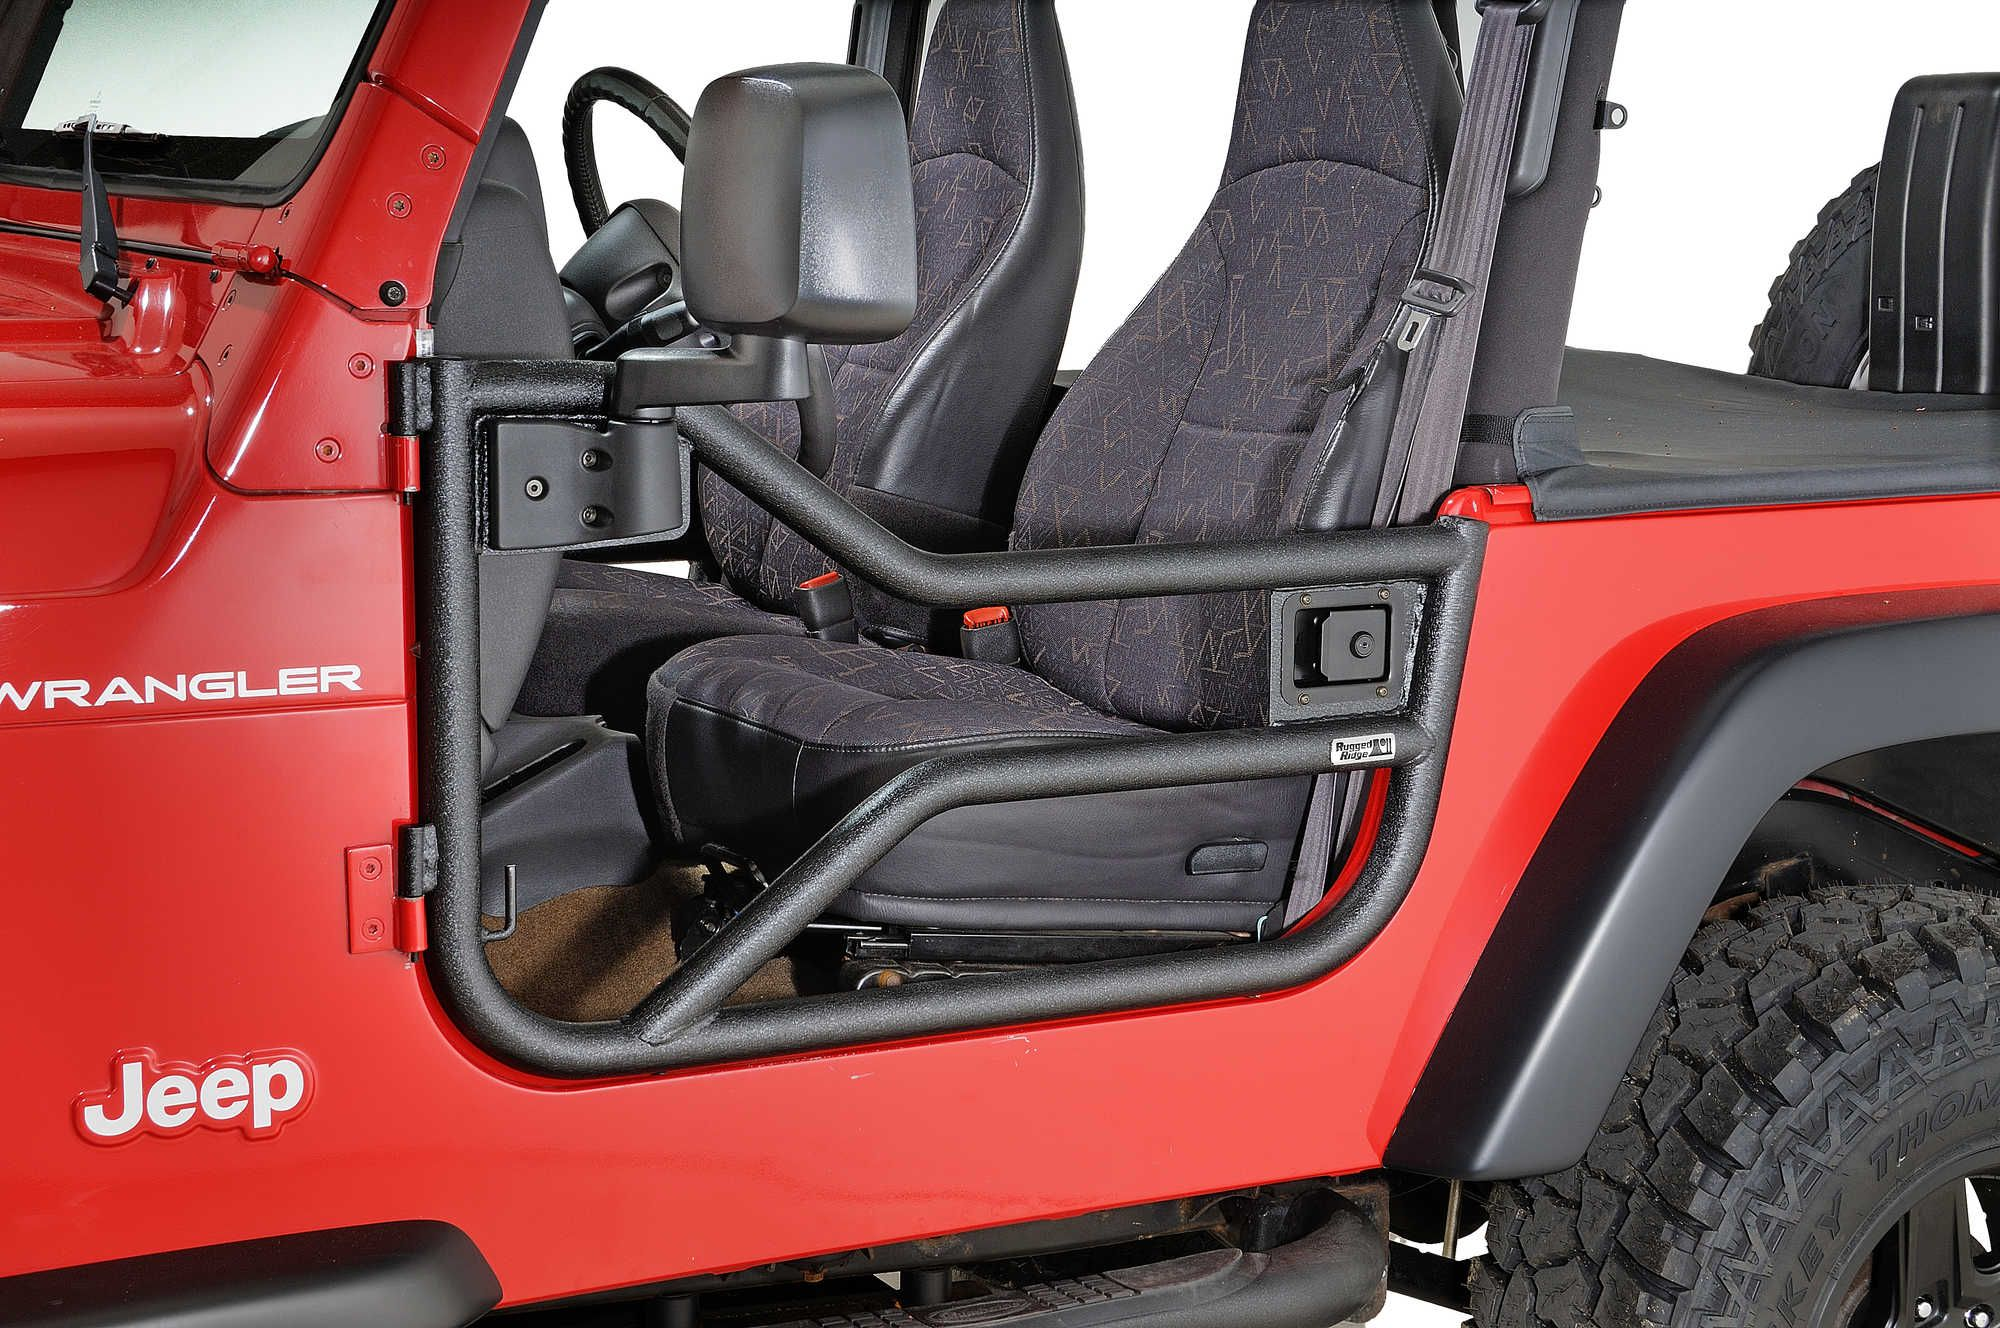 Rugged Ridge 11509 20 Tube Door Set For 97 06 Jeep Wrangler Tj Unlimited Jeep Jeep Wrangler Tj Jeep Doors